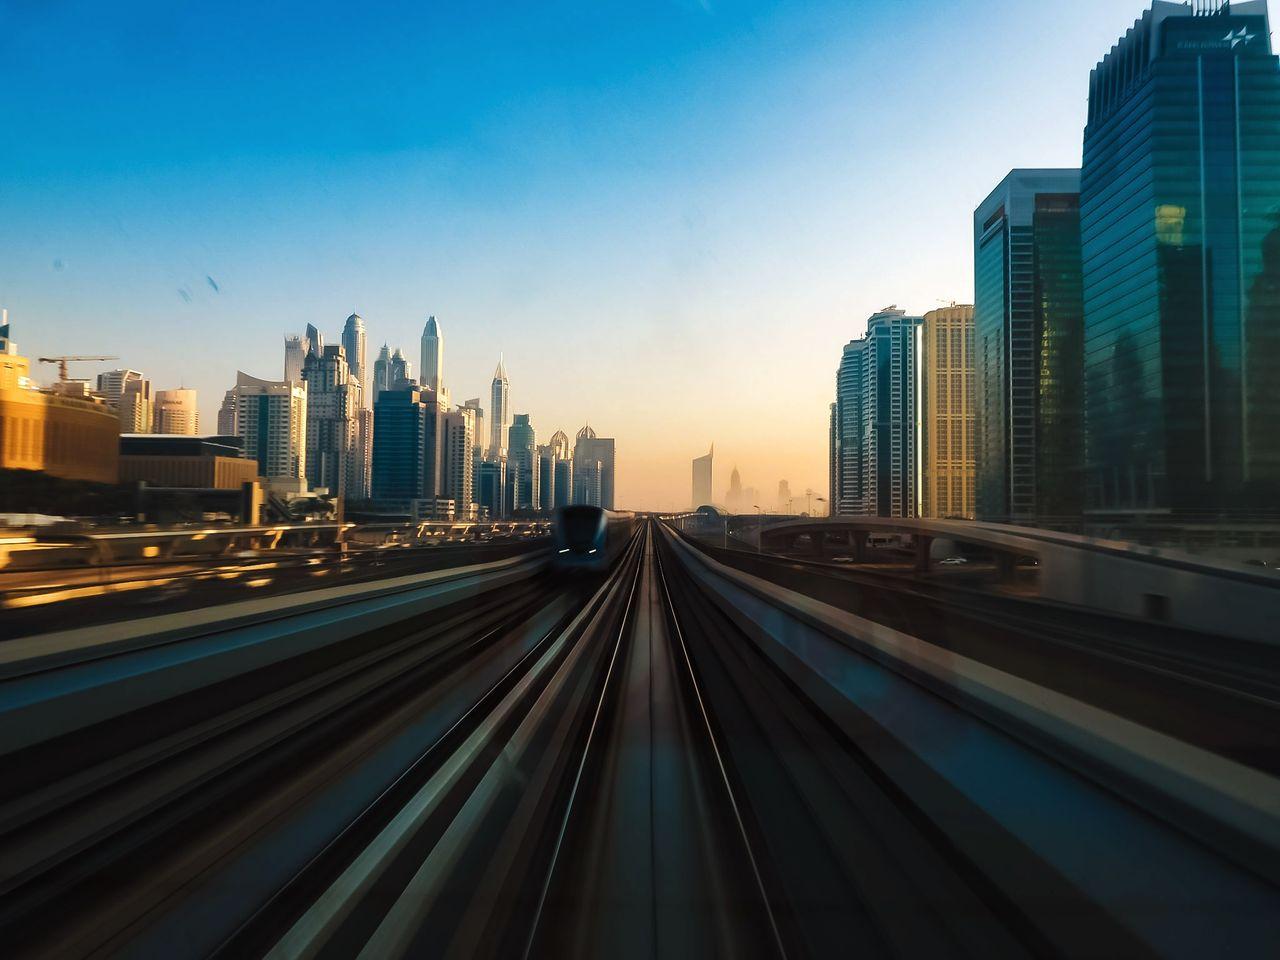 LIGHT TRAILS ON CITY AGAINST BLUE SKY